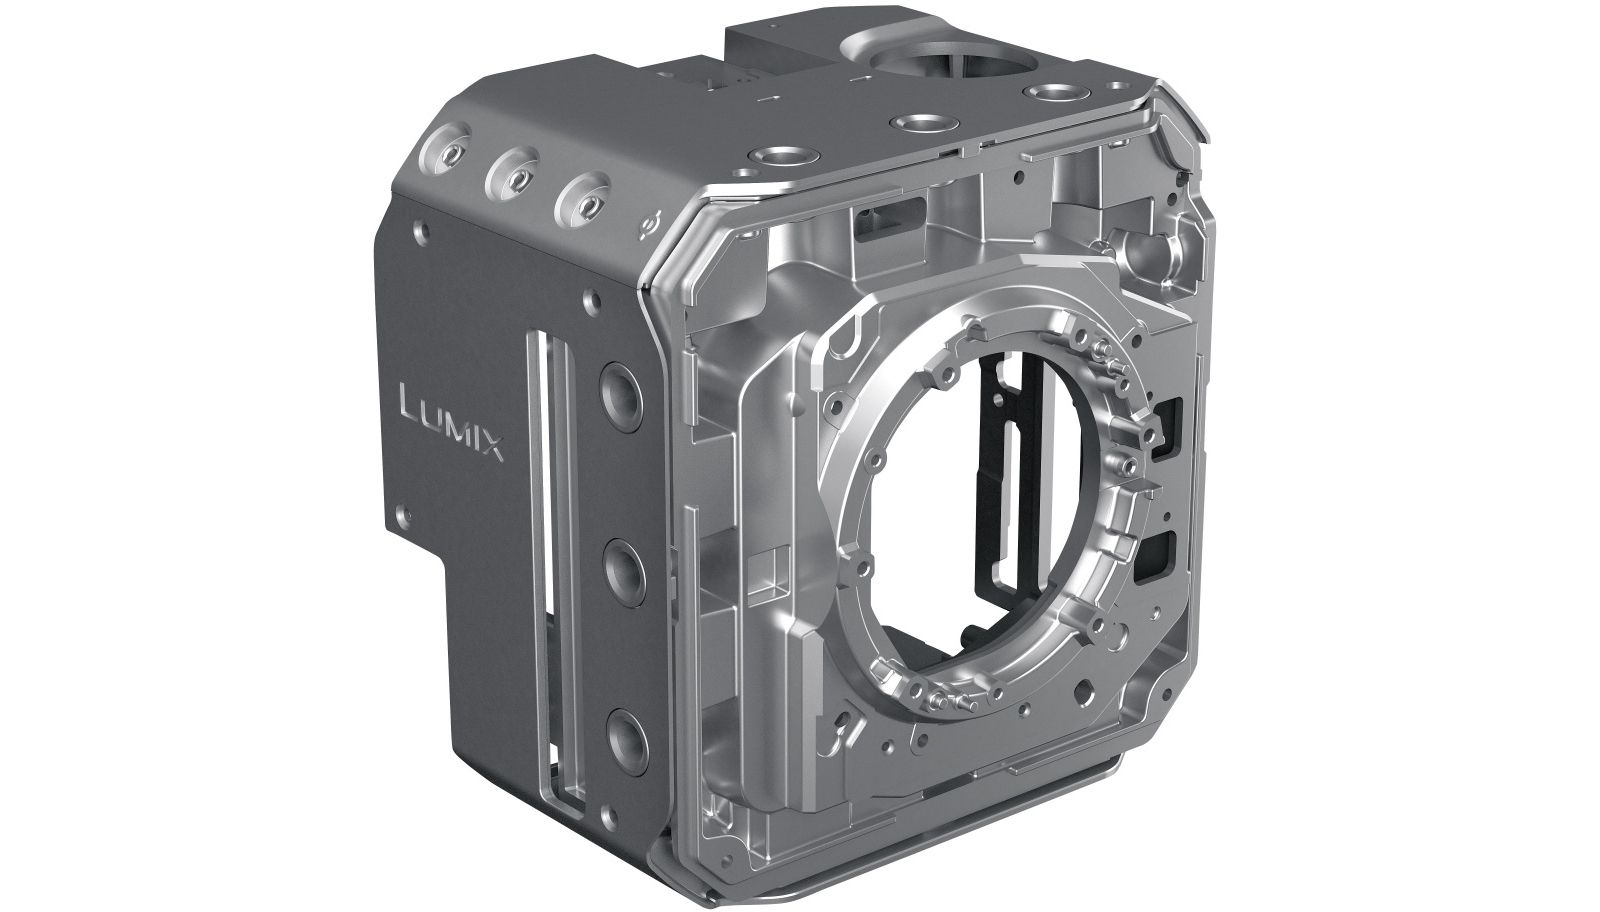 Корпус Panasonic Lumix BGH1 из магниевого сплава